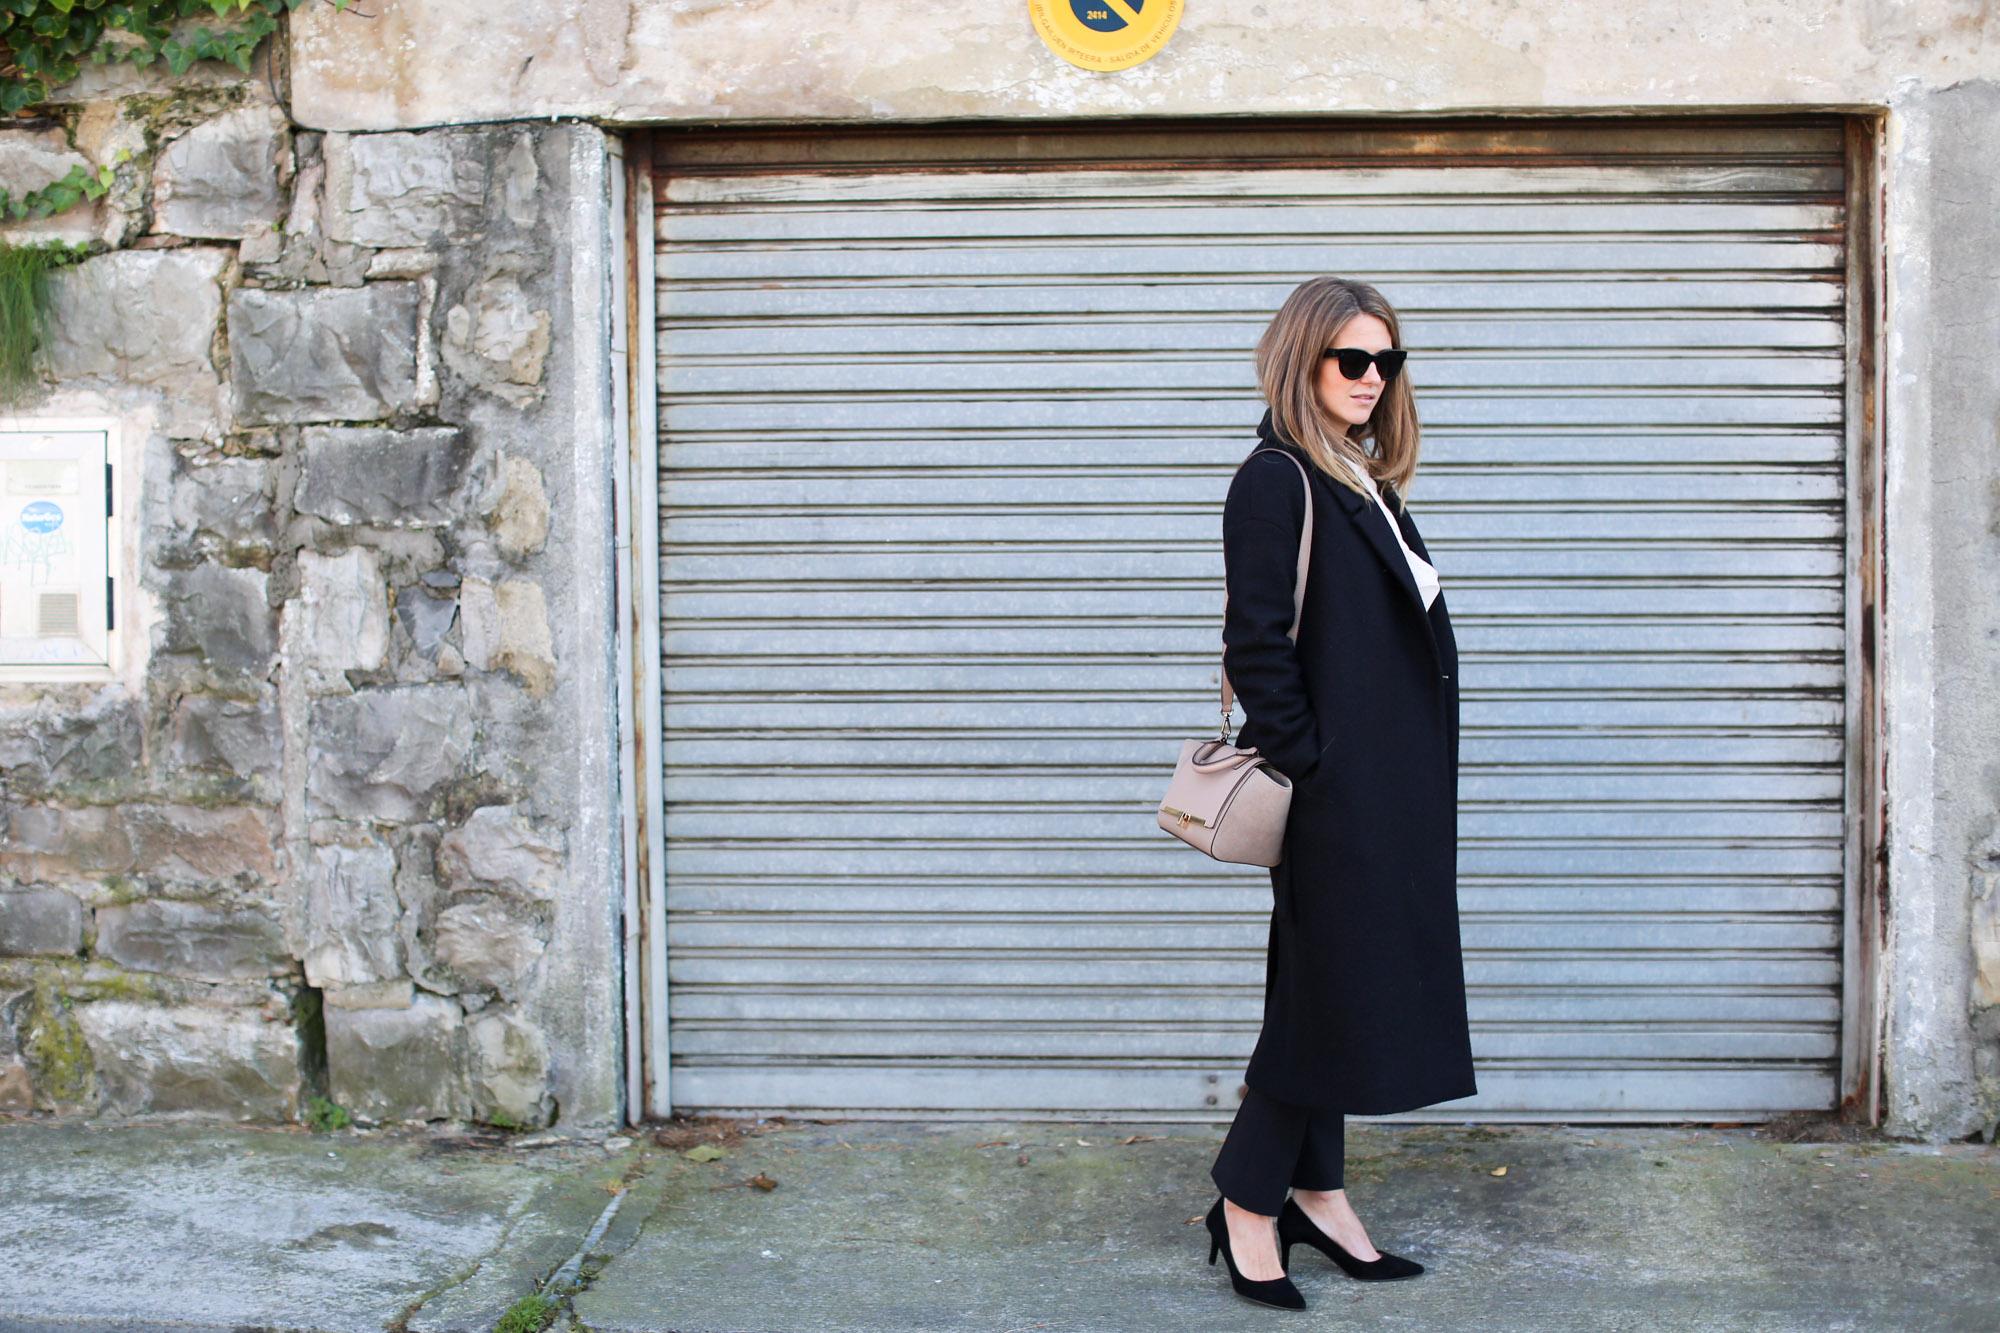 clochet_streetstyle_fashionblogger_cosnuderibbonsweatshirt_otherstoriessuedestilettos_coswoollongcoat-2